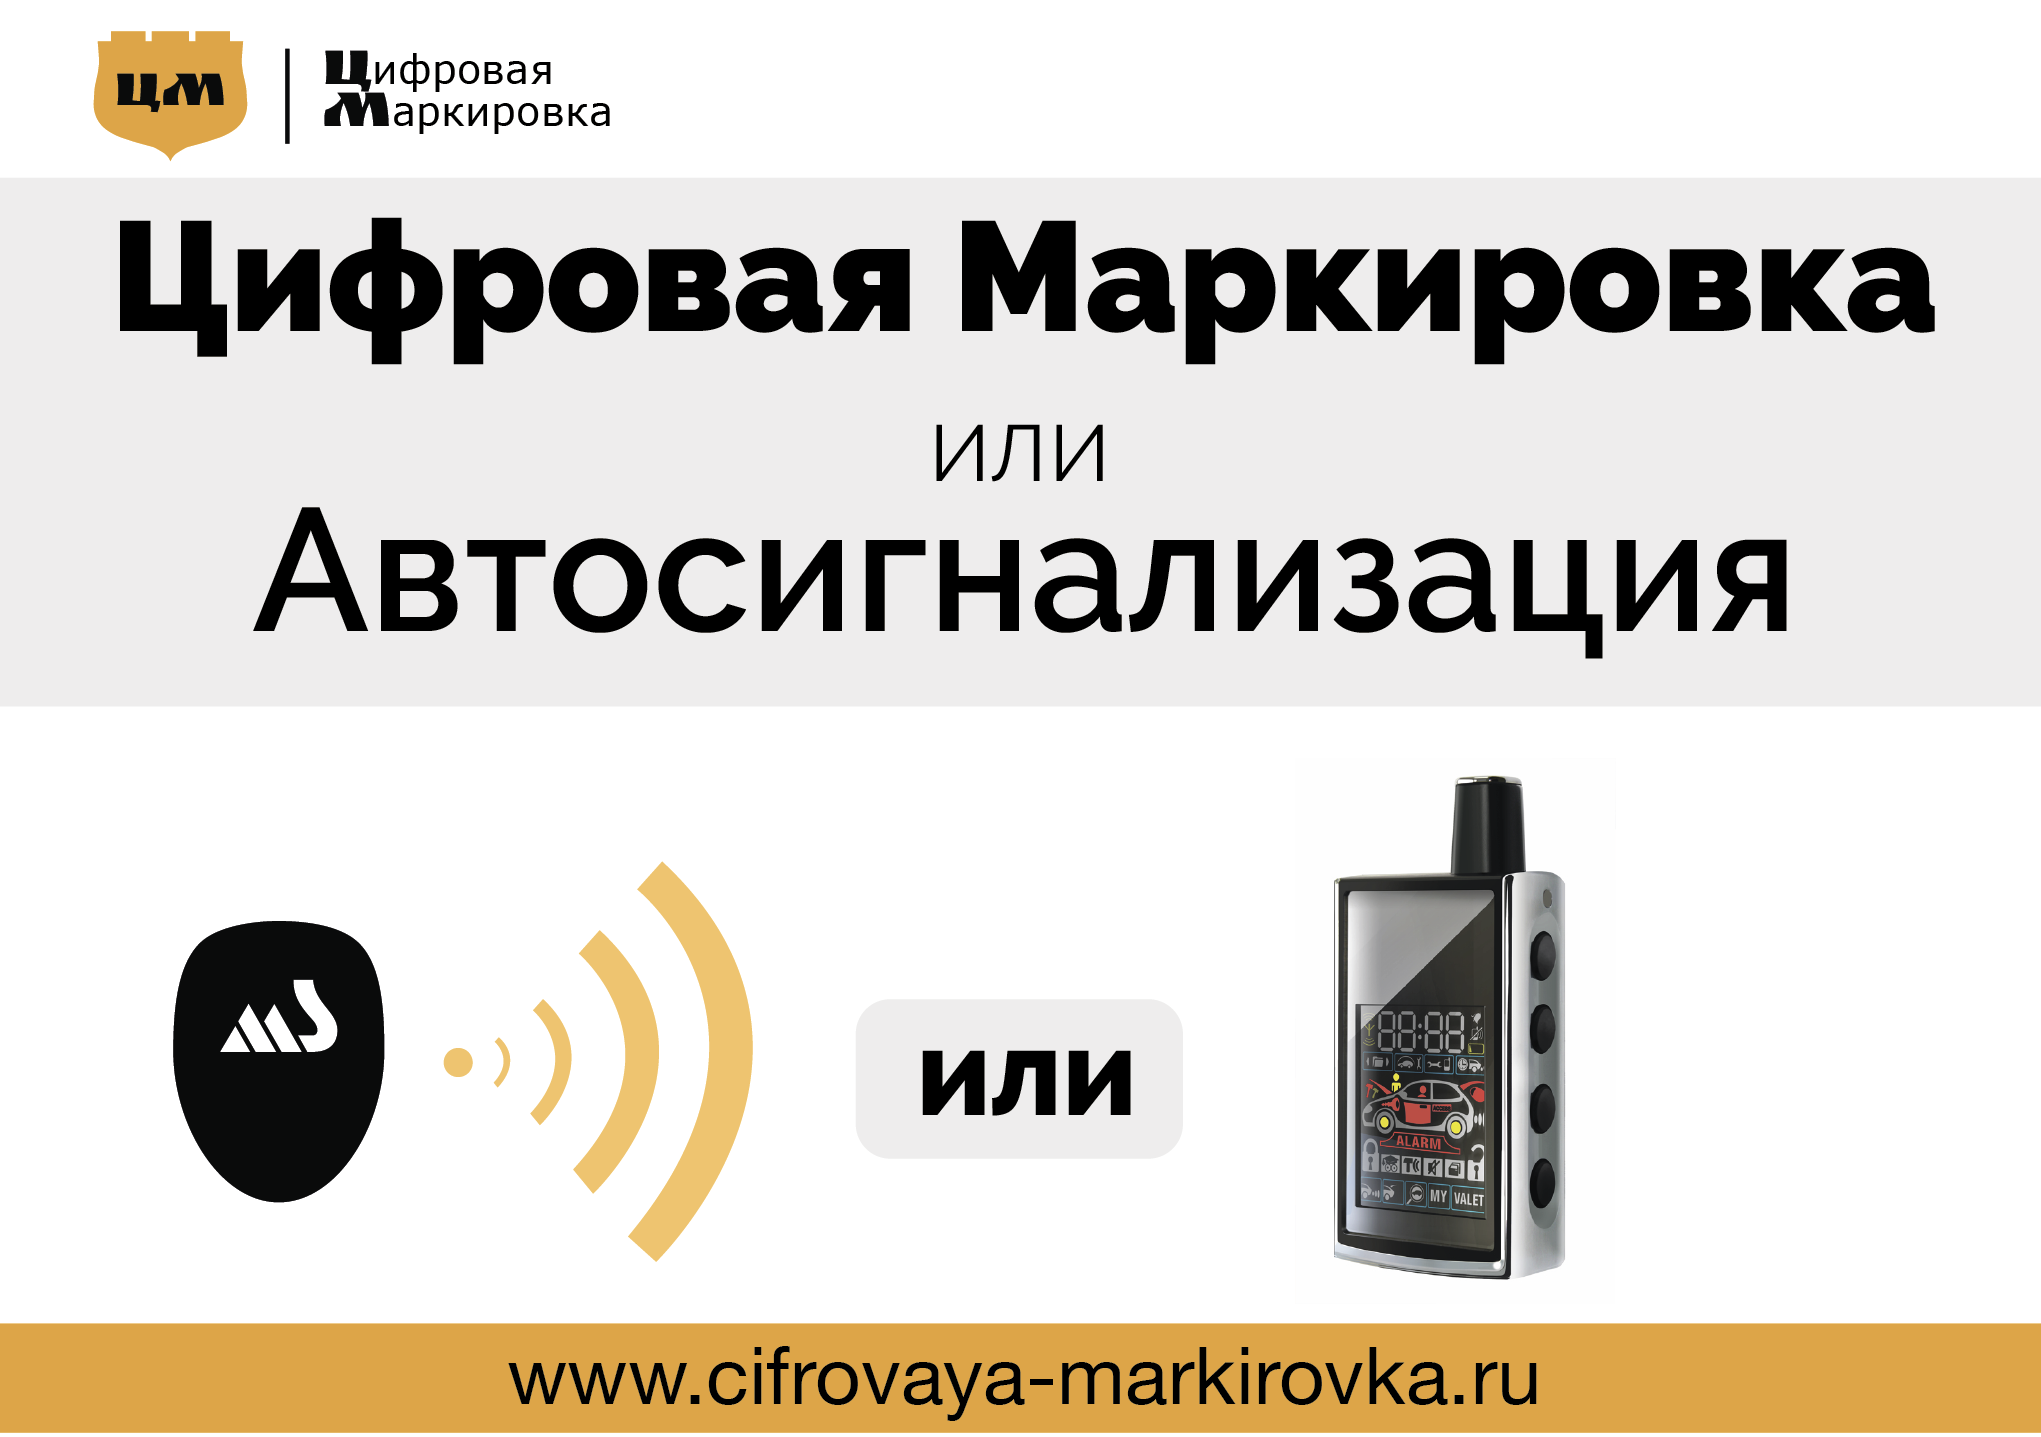 cifrovaya-markirovka-9-1